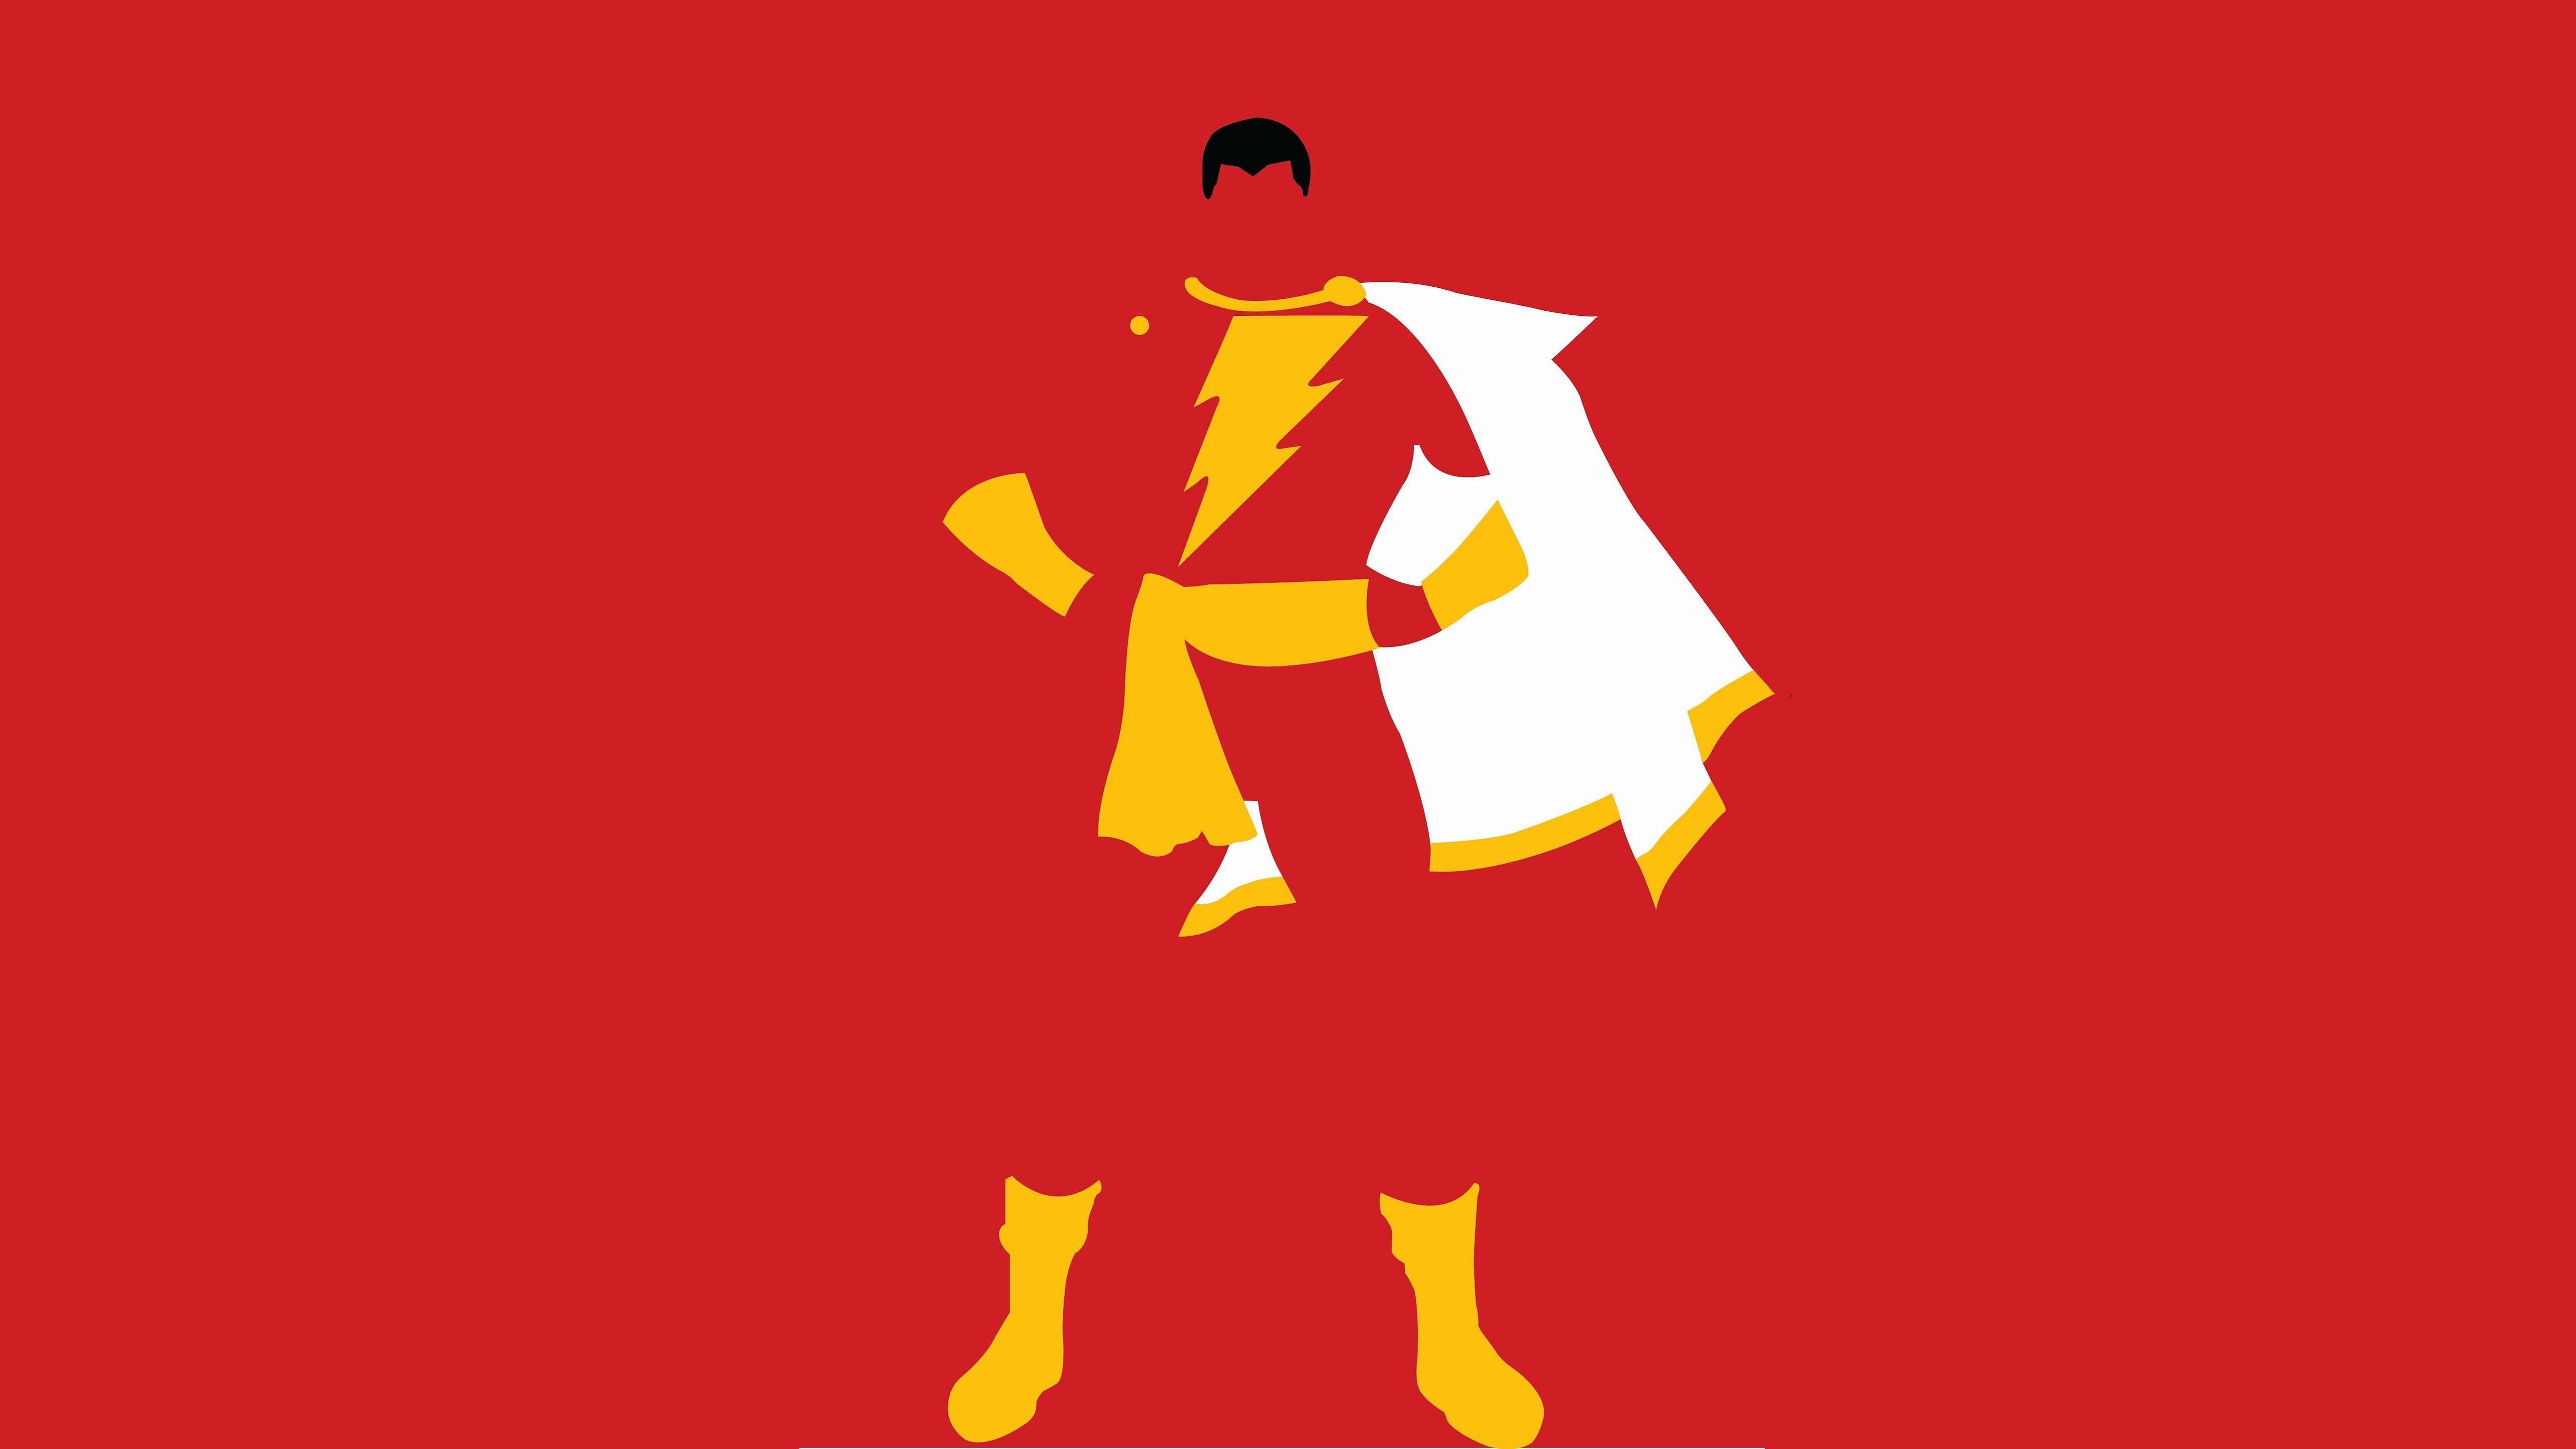 1920x1080 Captain Marvel Billy Batson Shazam DC